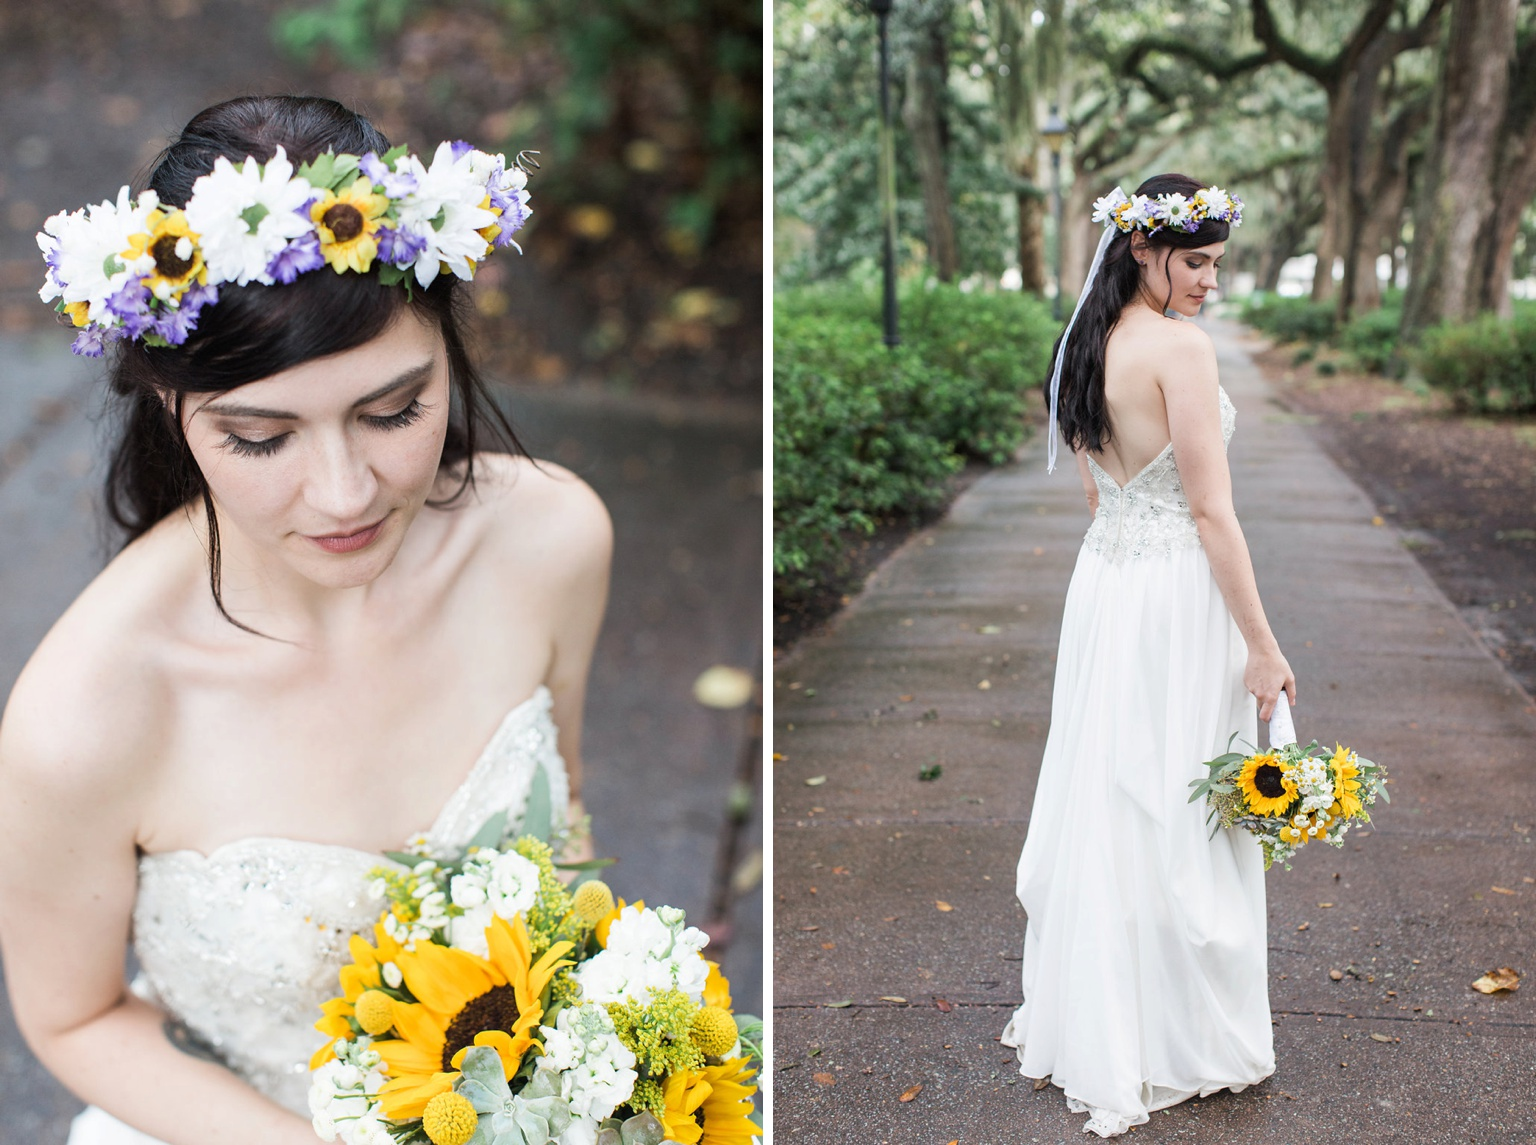 Apt_B_Photo_Savannah_Wedding_Photographer_Flower_Crown045.JPG